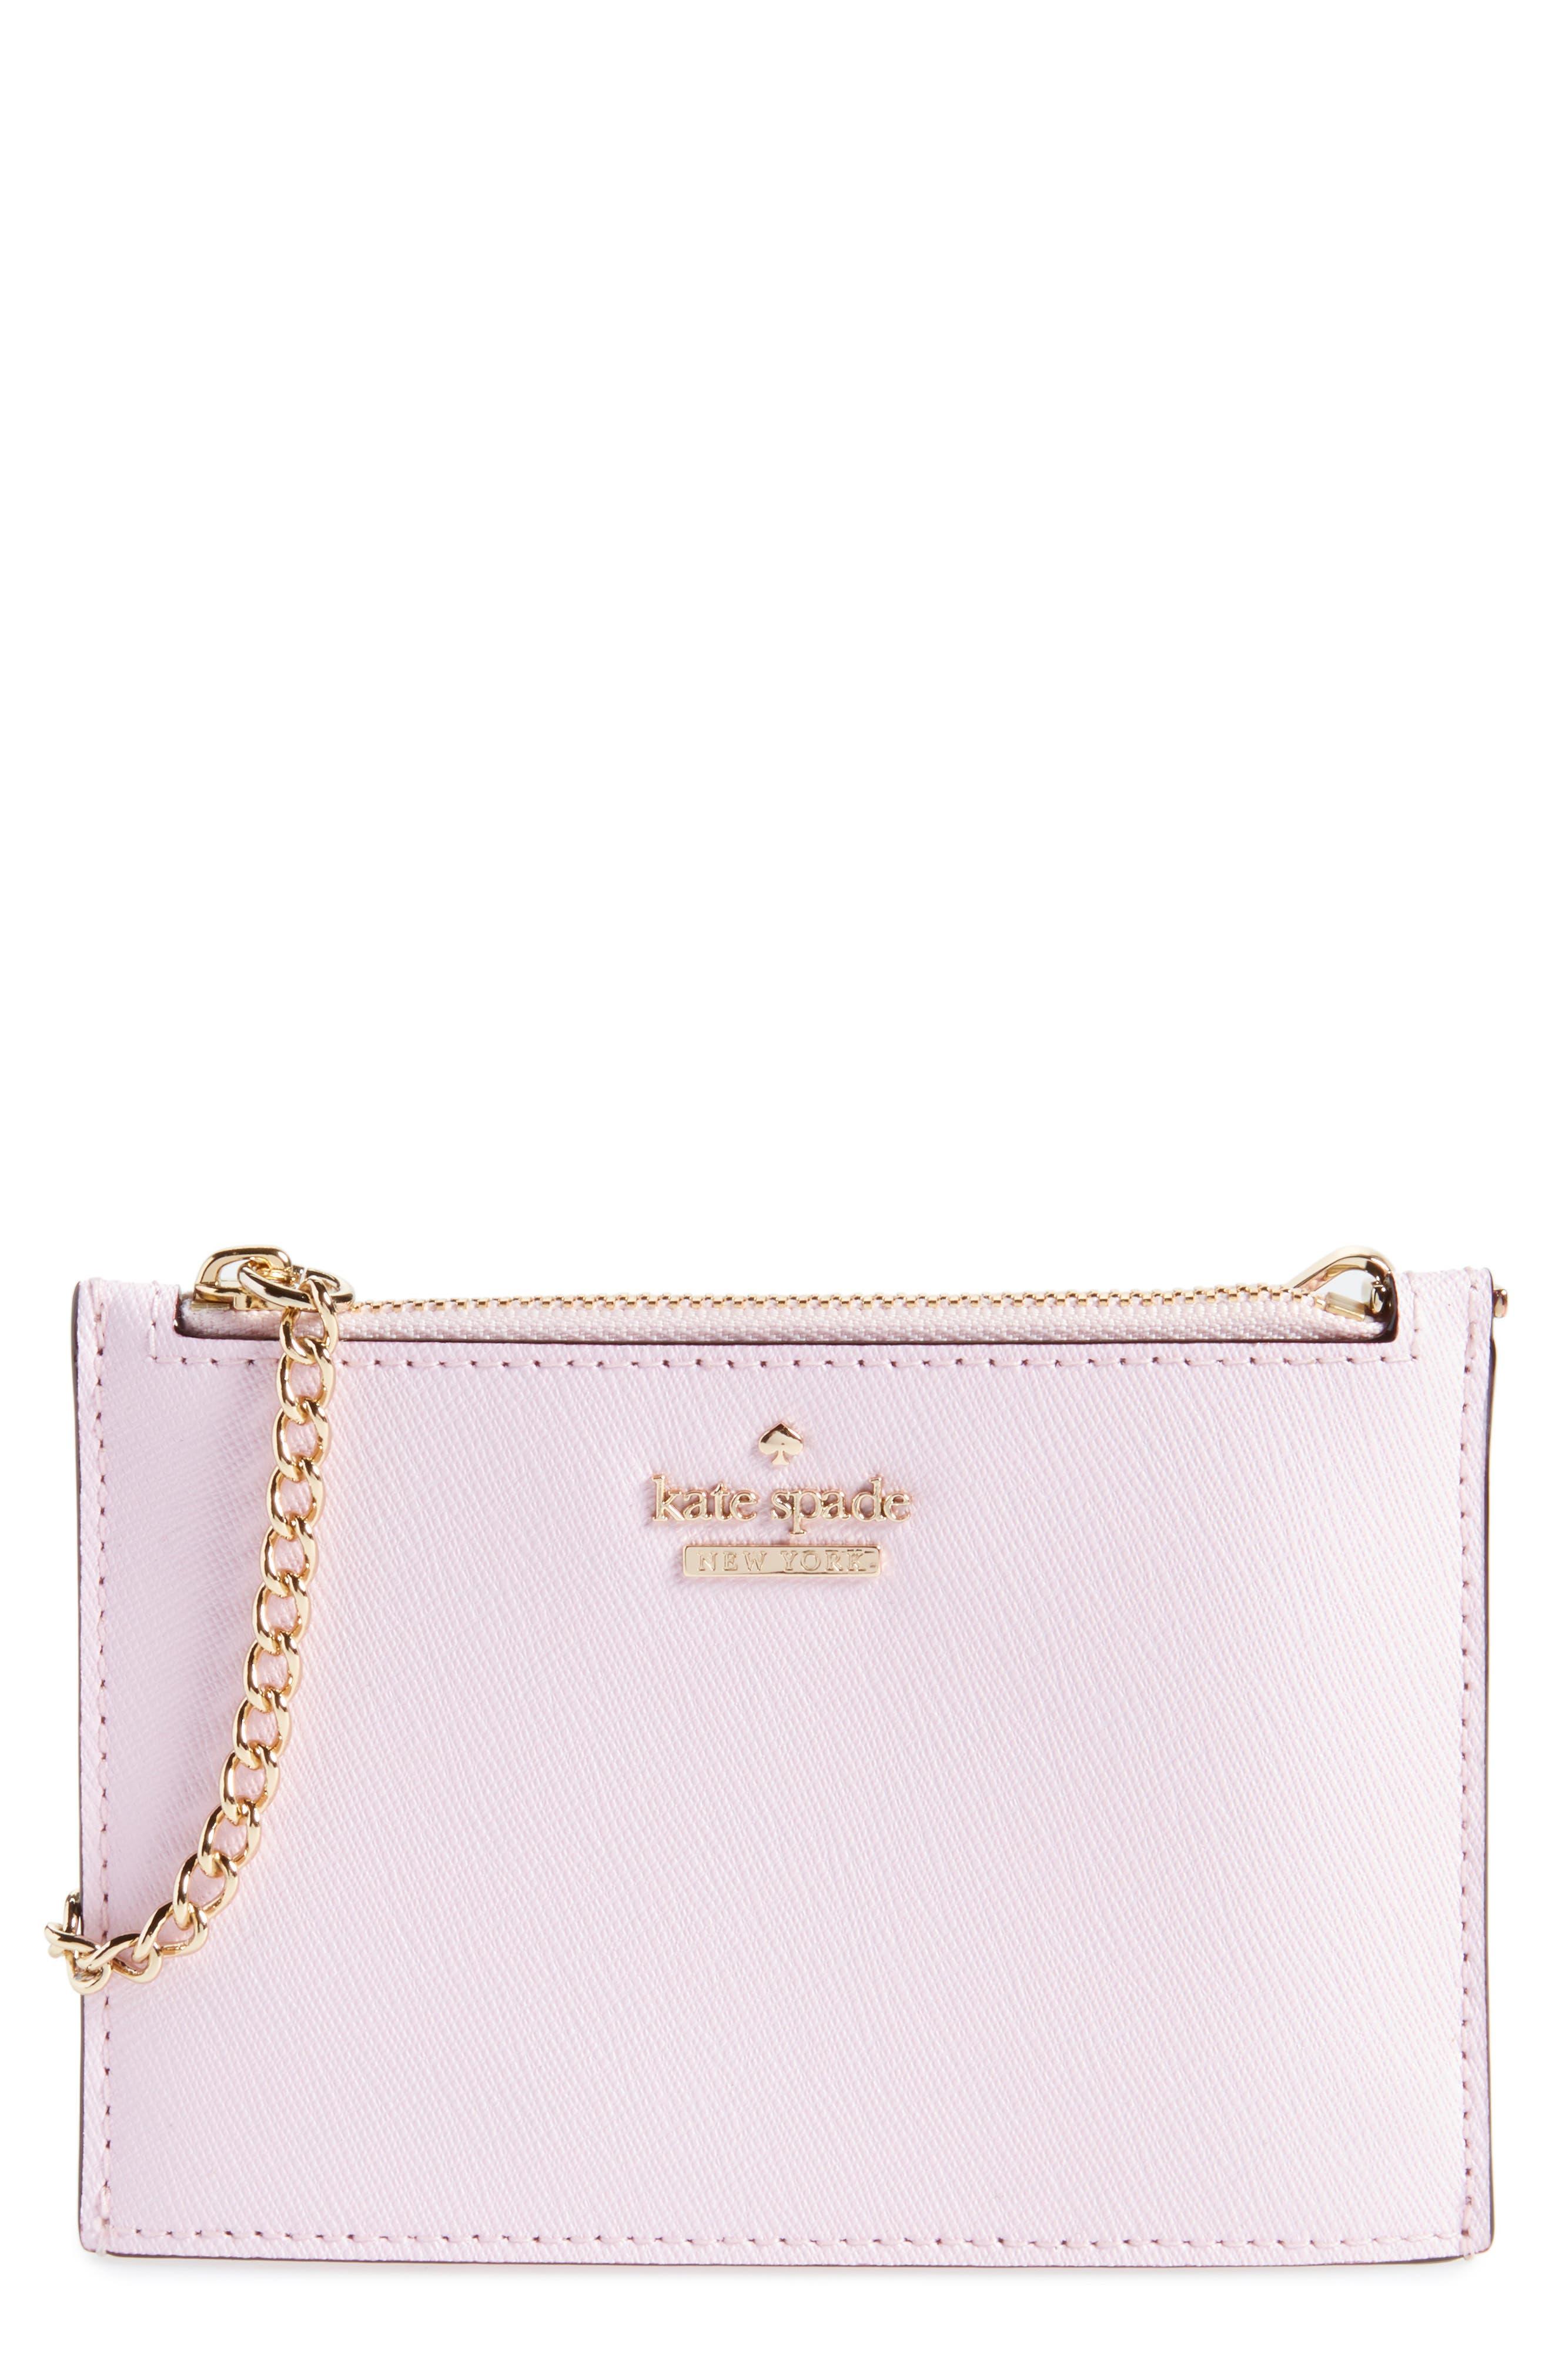 cameron street caroline leather zip pouch,                         Main,                         color, Pink Lemonade